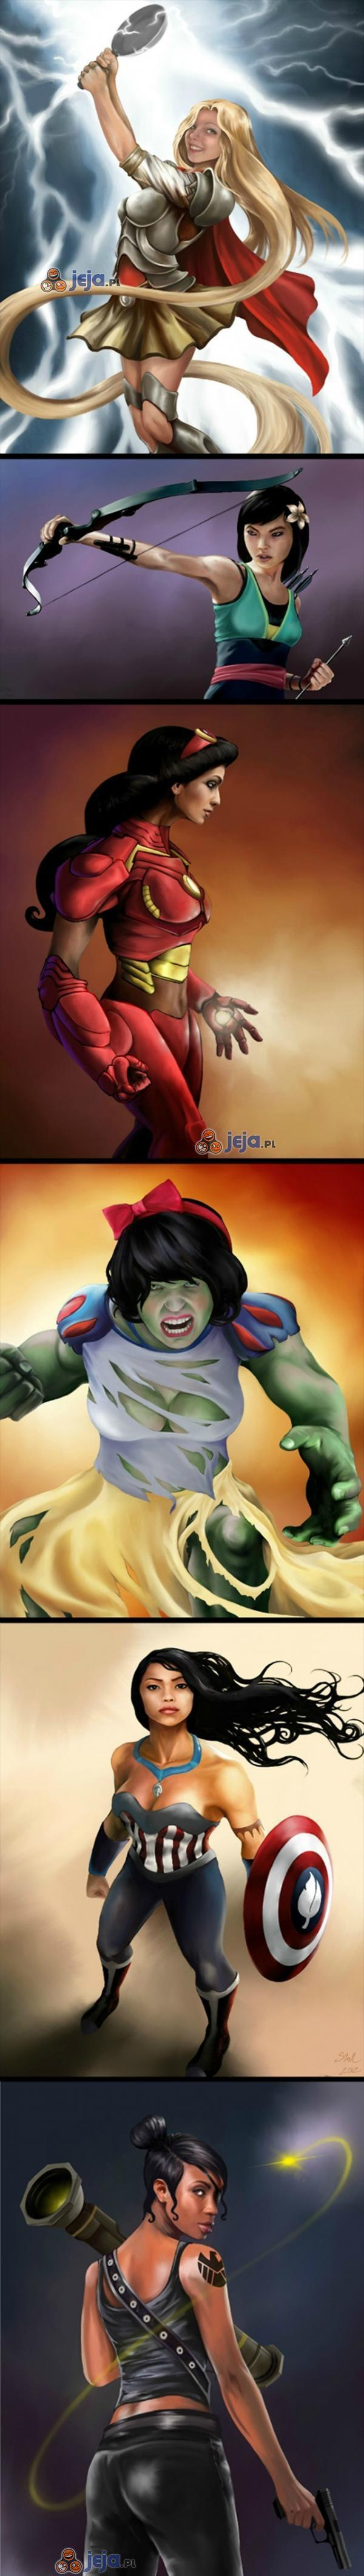 Księżniczki jako Avengersi